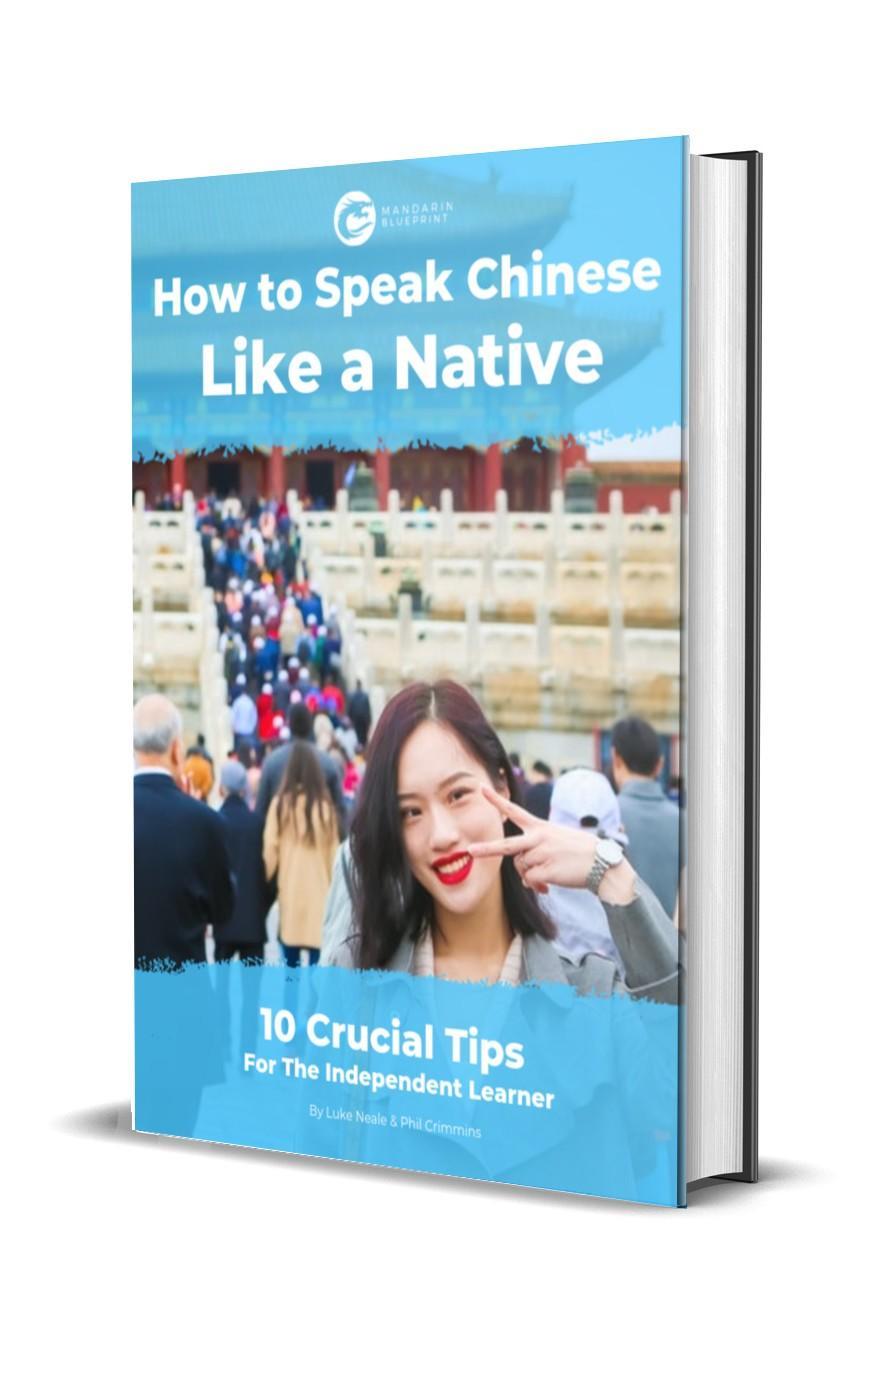 How to Speak Chinese like a Native eBook